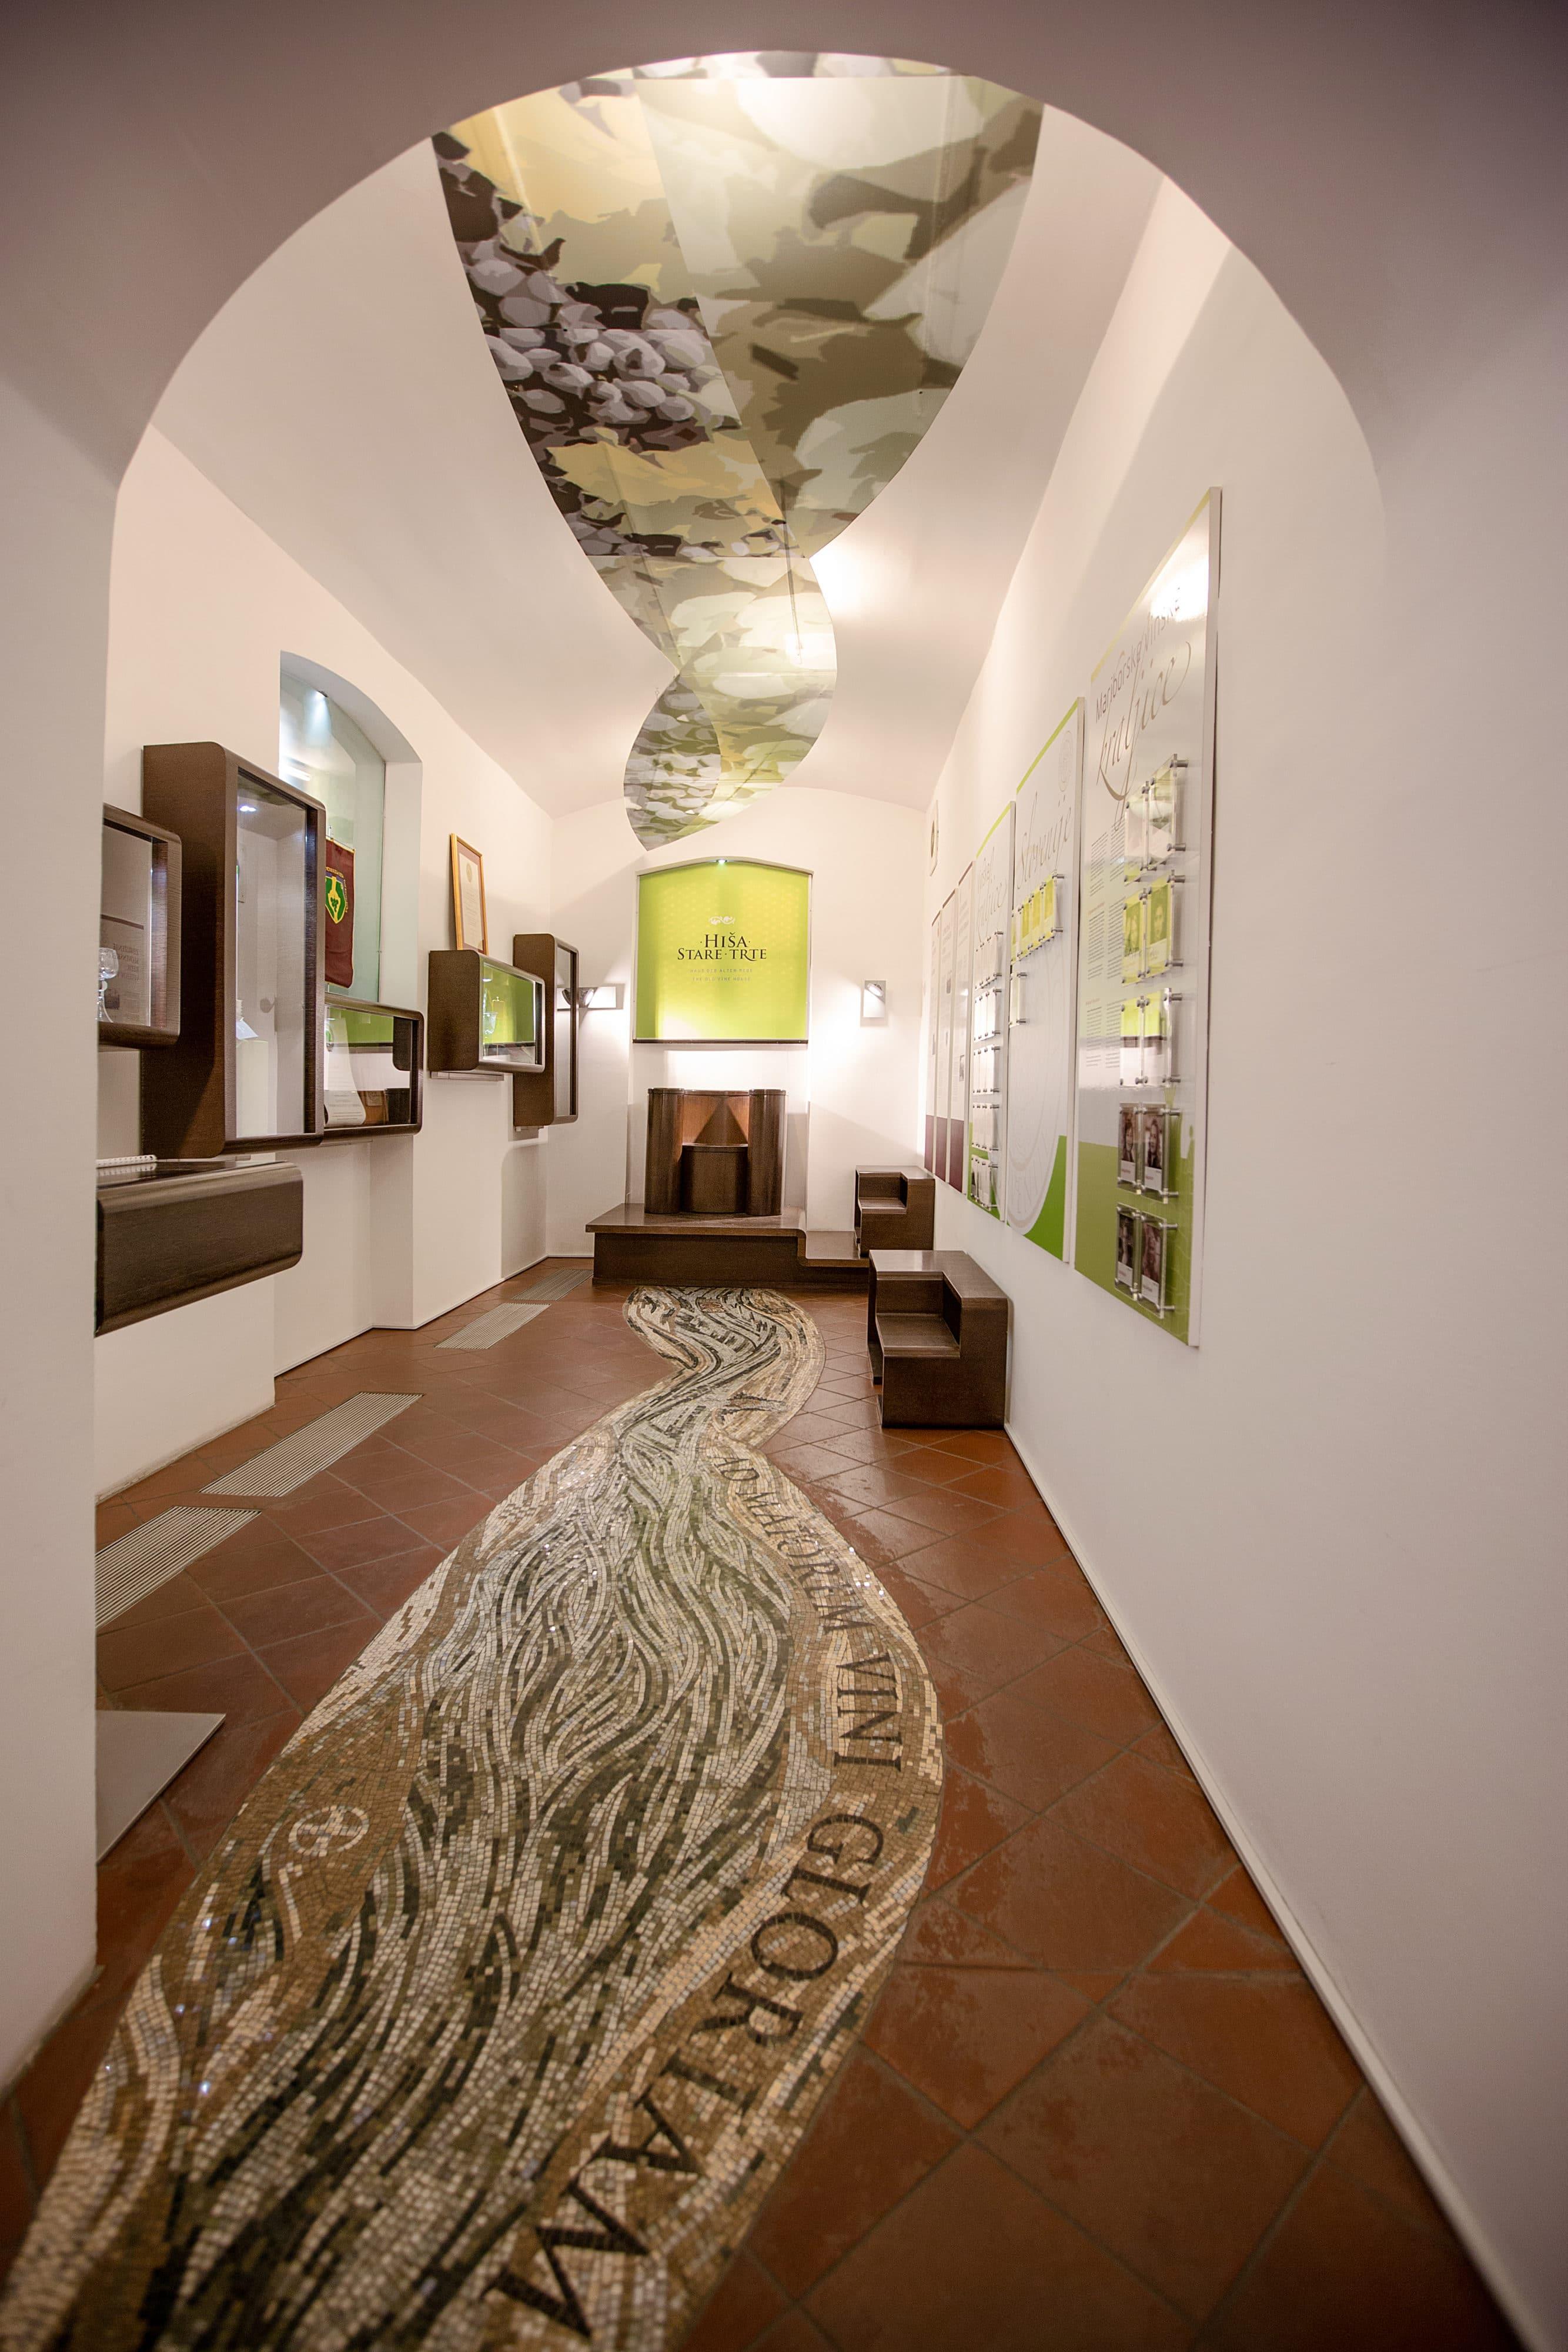 maribor_old_vine_house_mosaic